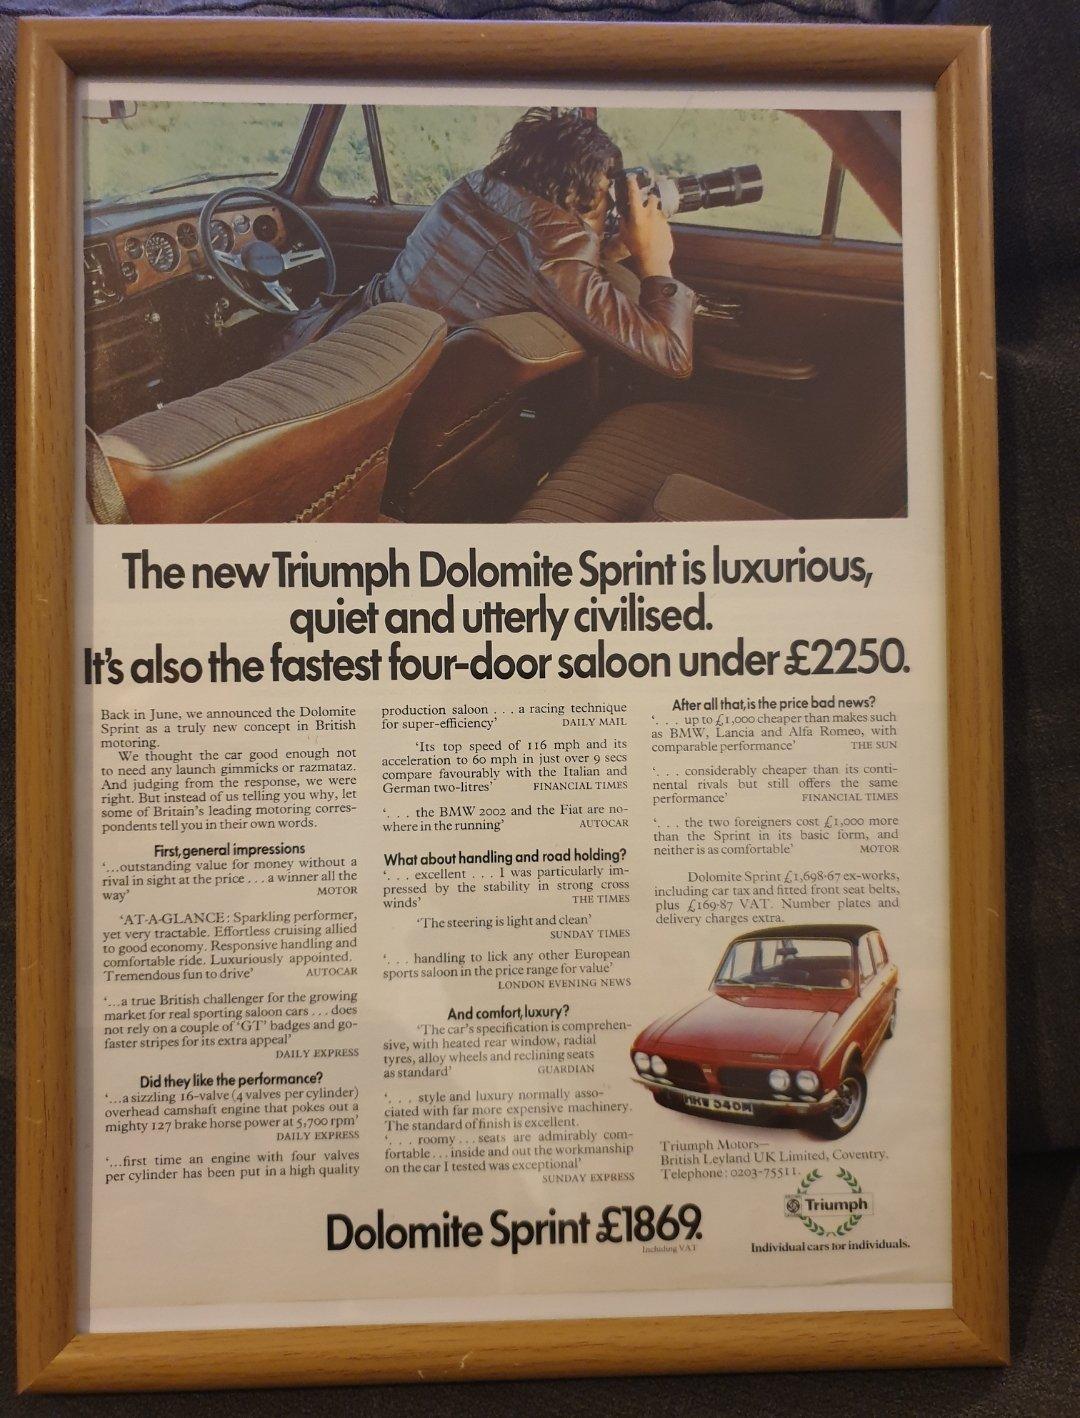 1973 Original Triumph Dolomite Sprint Advert For Sale (picture 1 of 2)